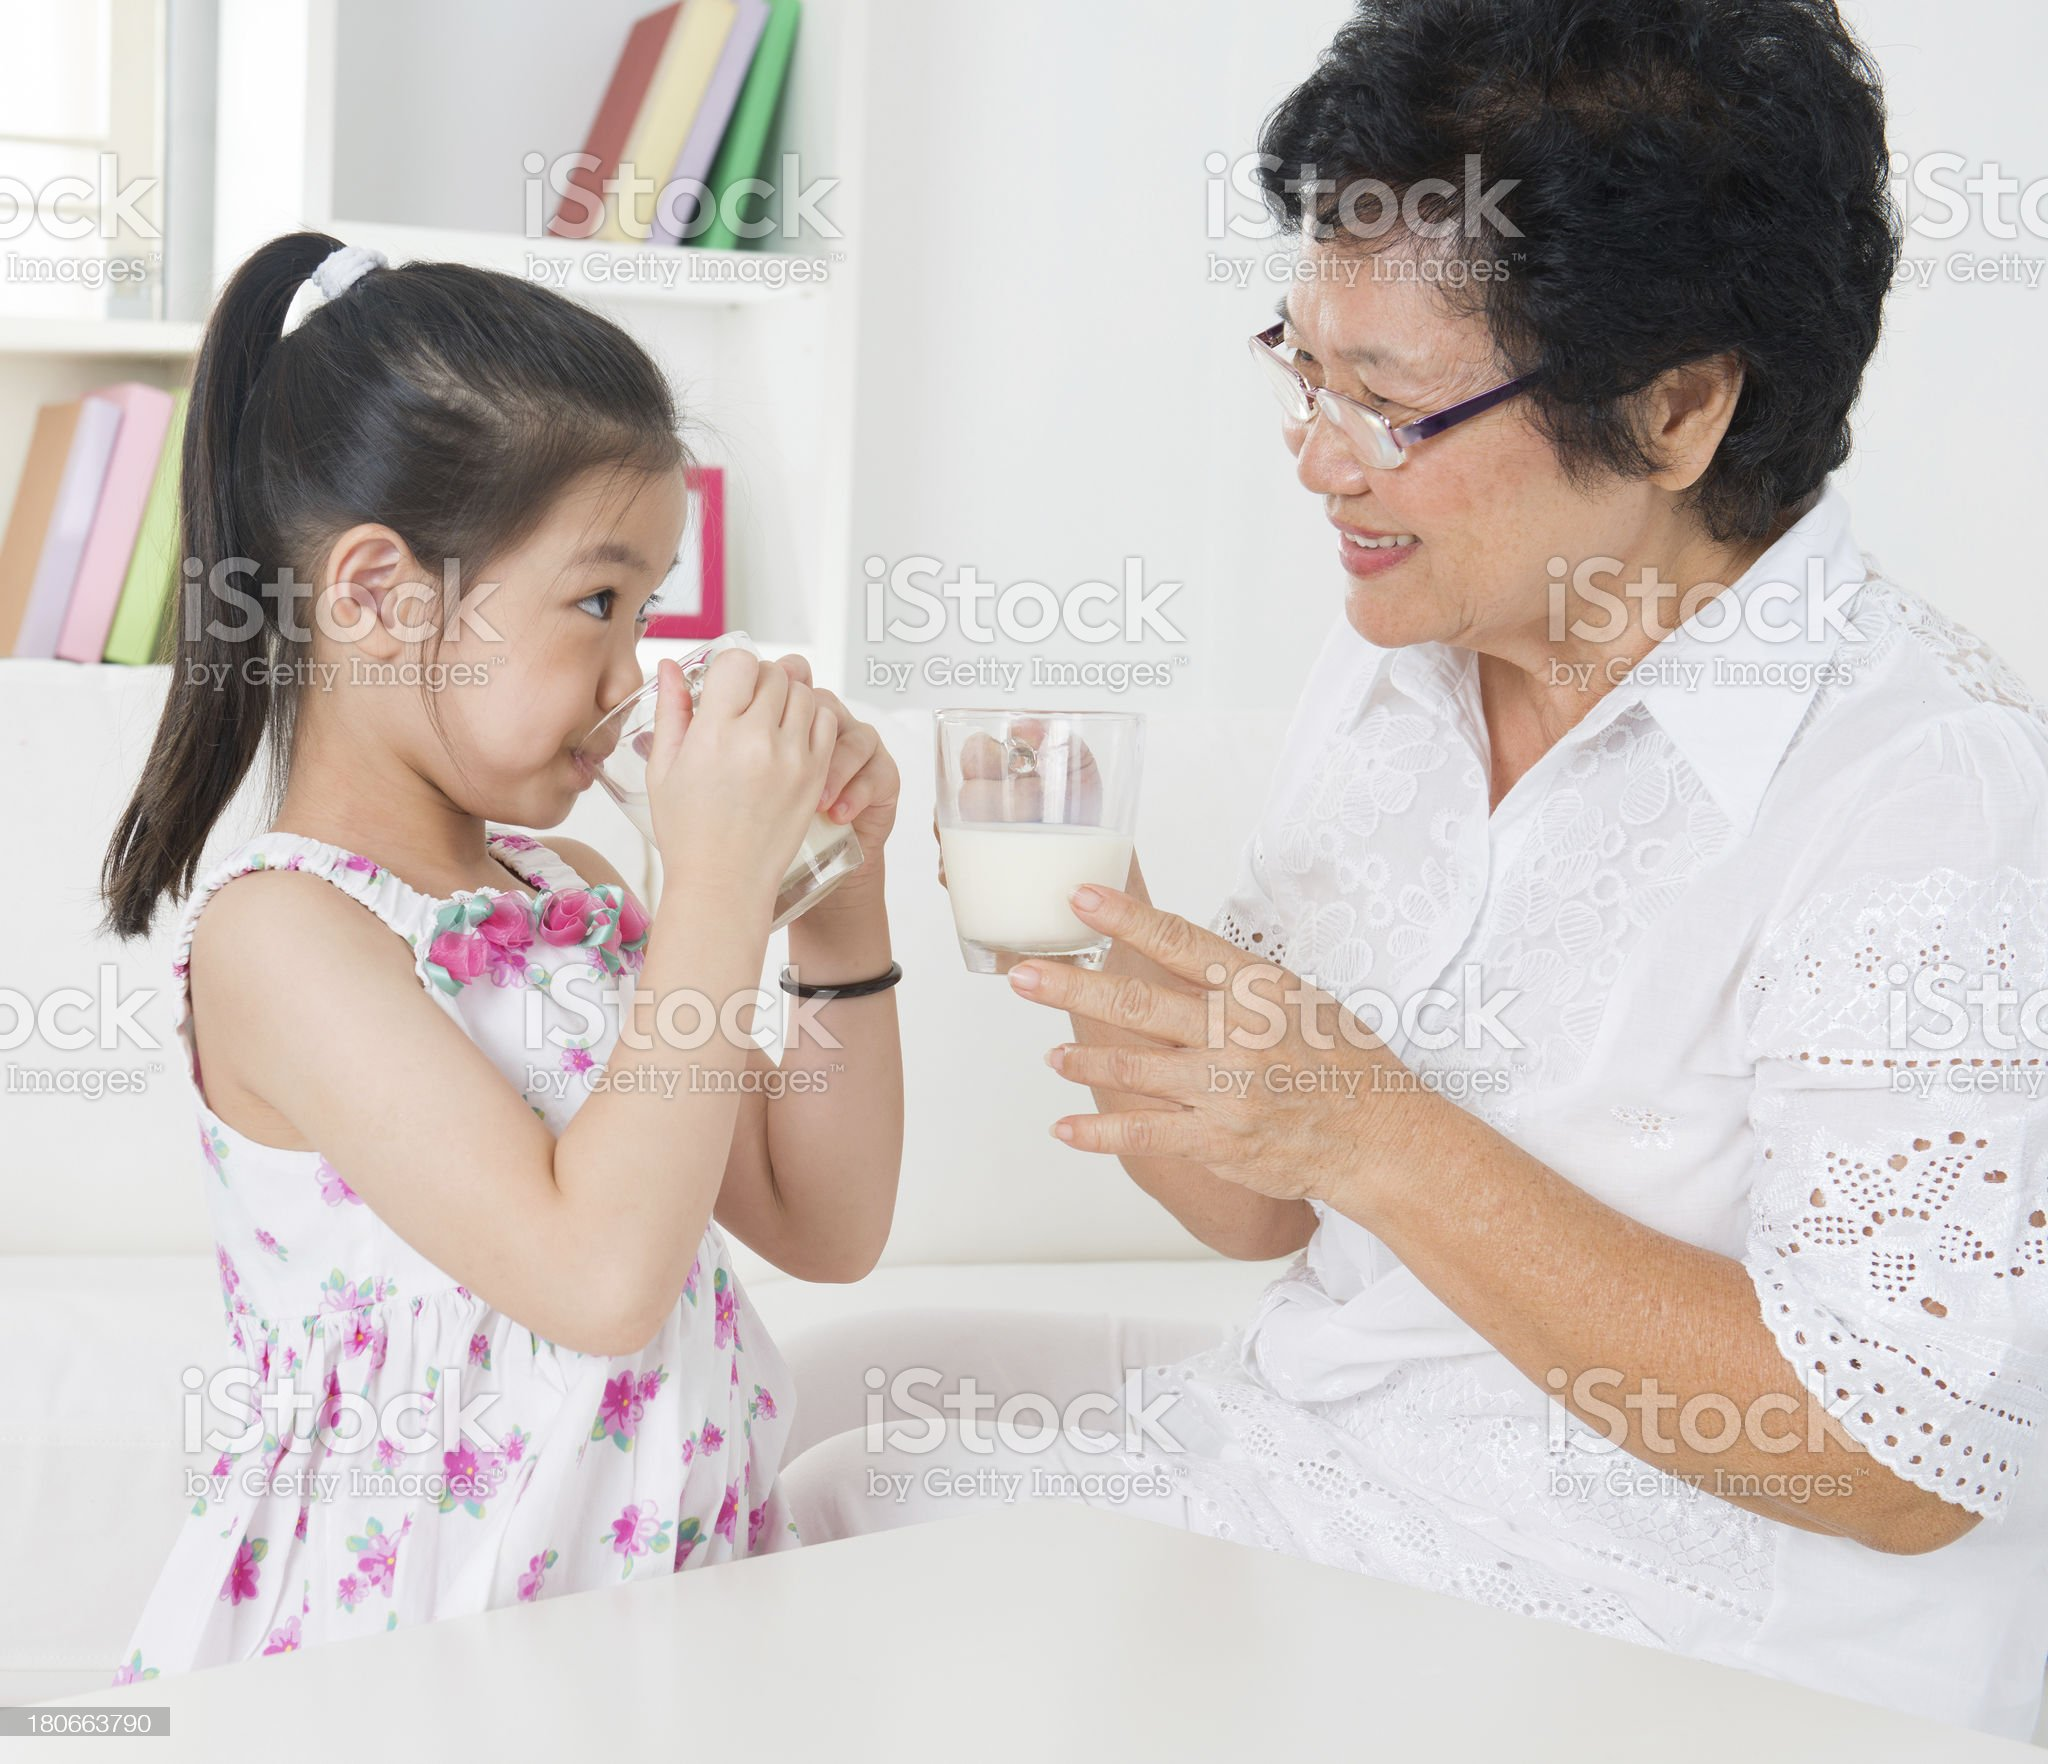 Drinking milk. royalty-free stock photo